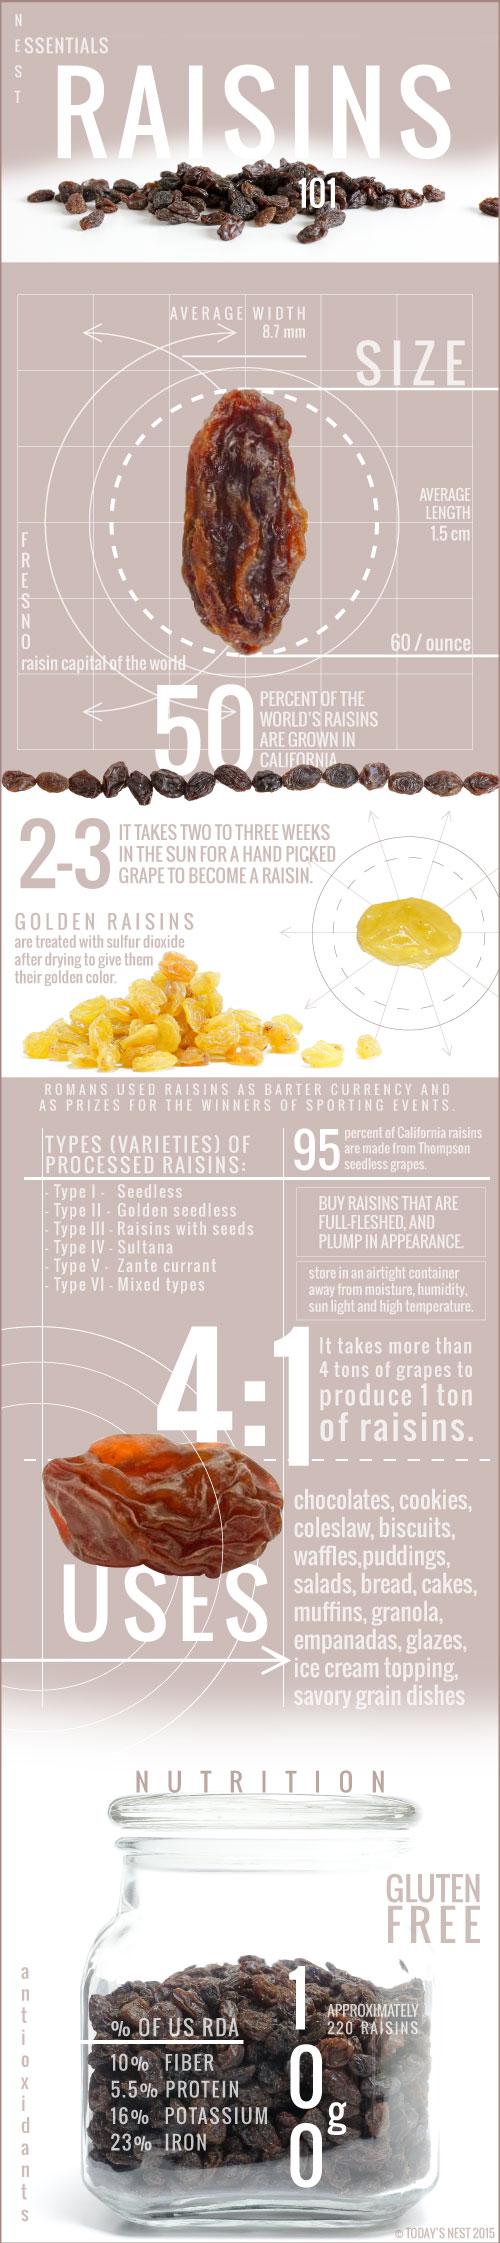 Raisin Inforgraphic by Sam Henderson of Today's Nest